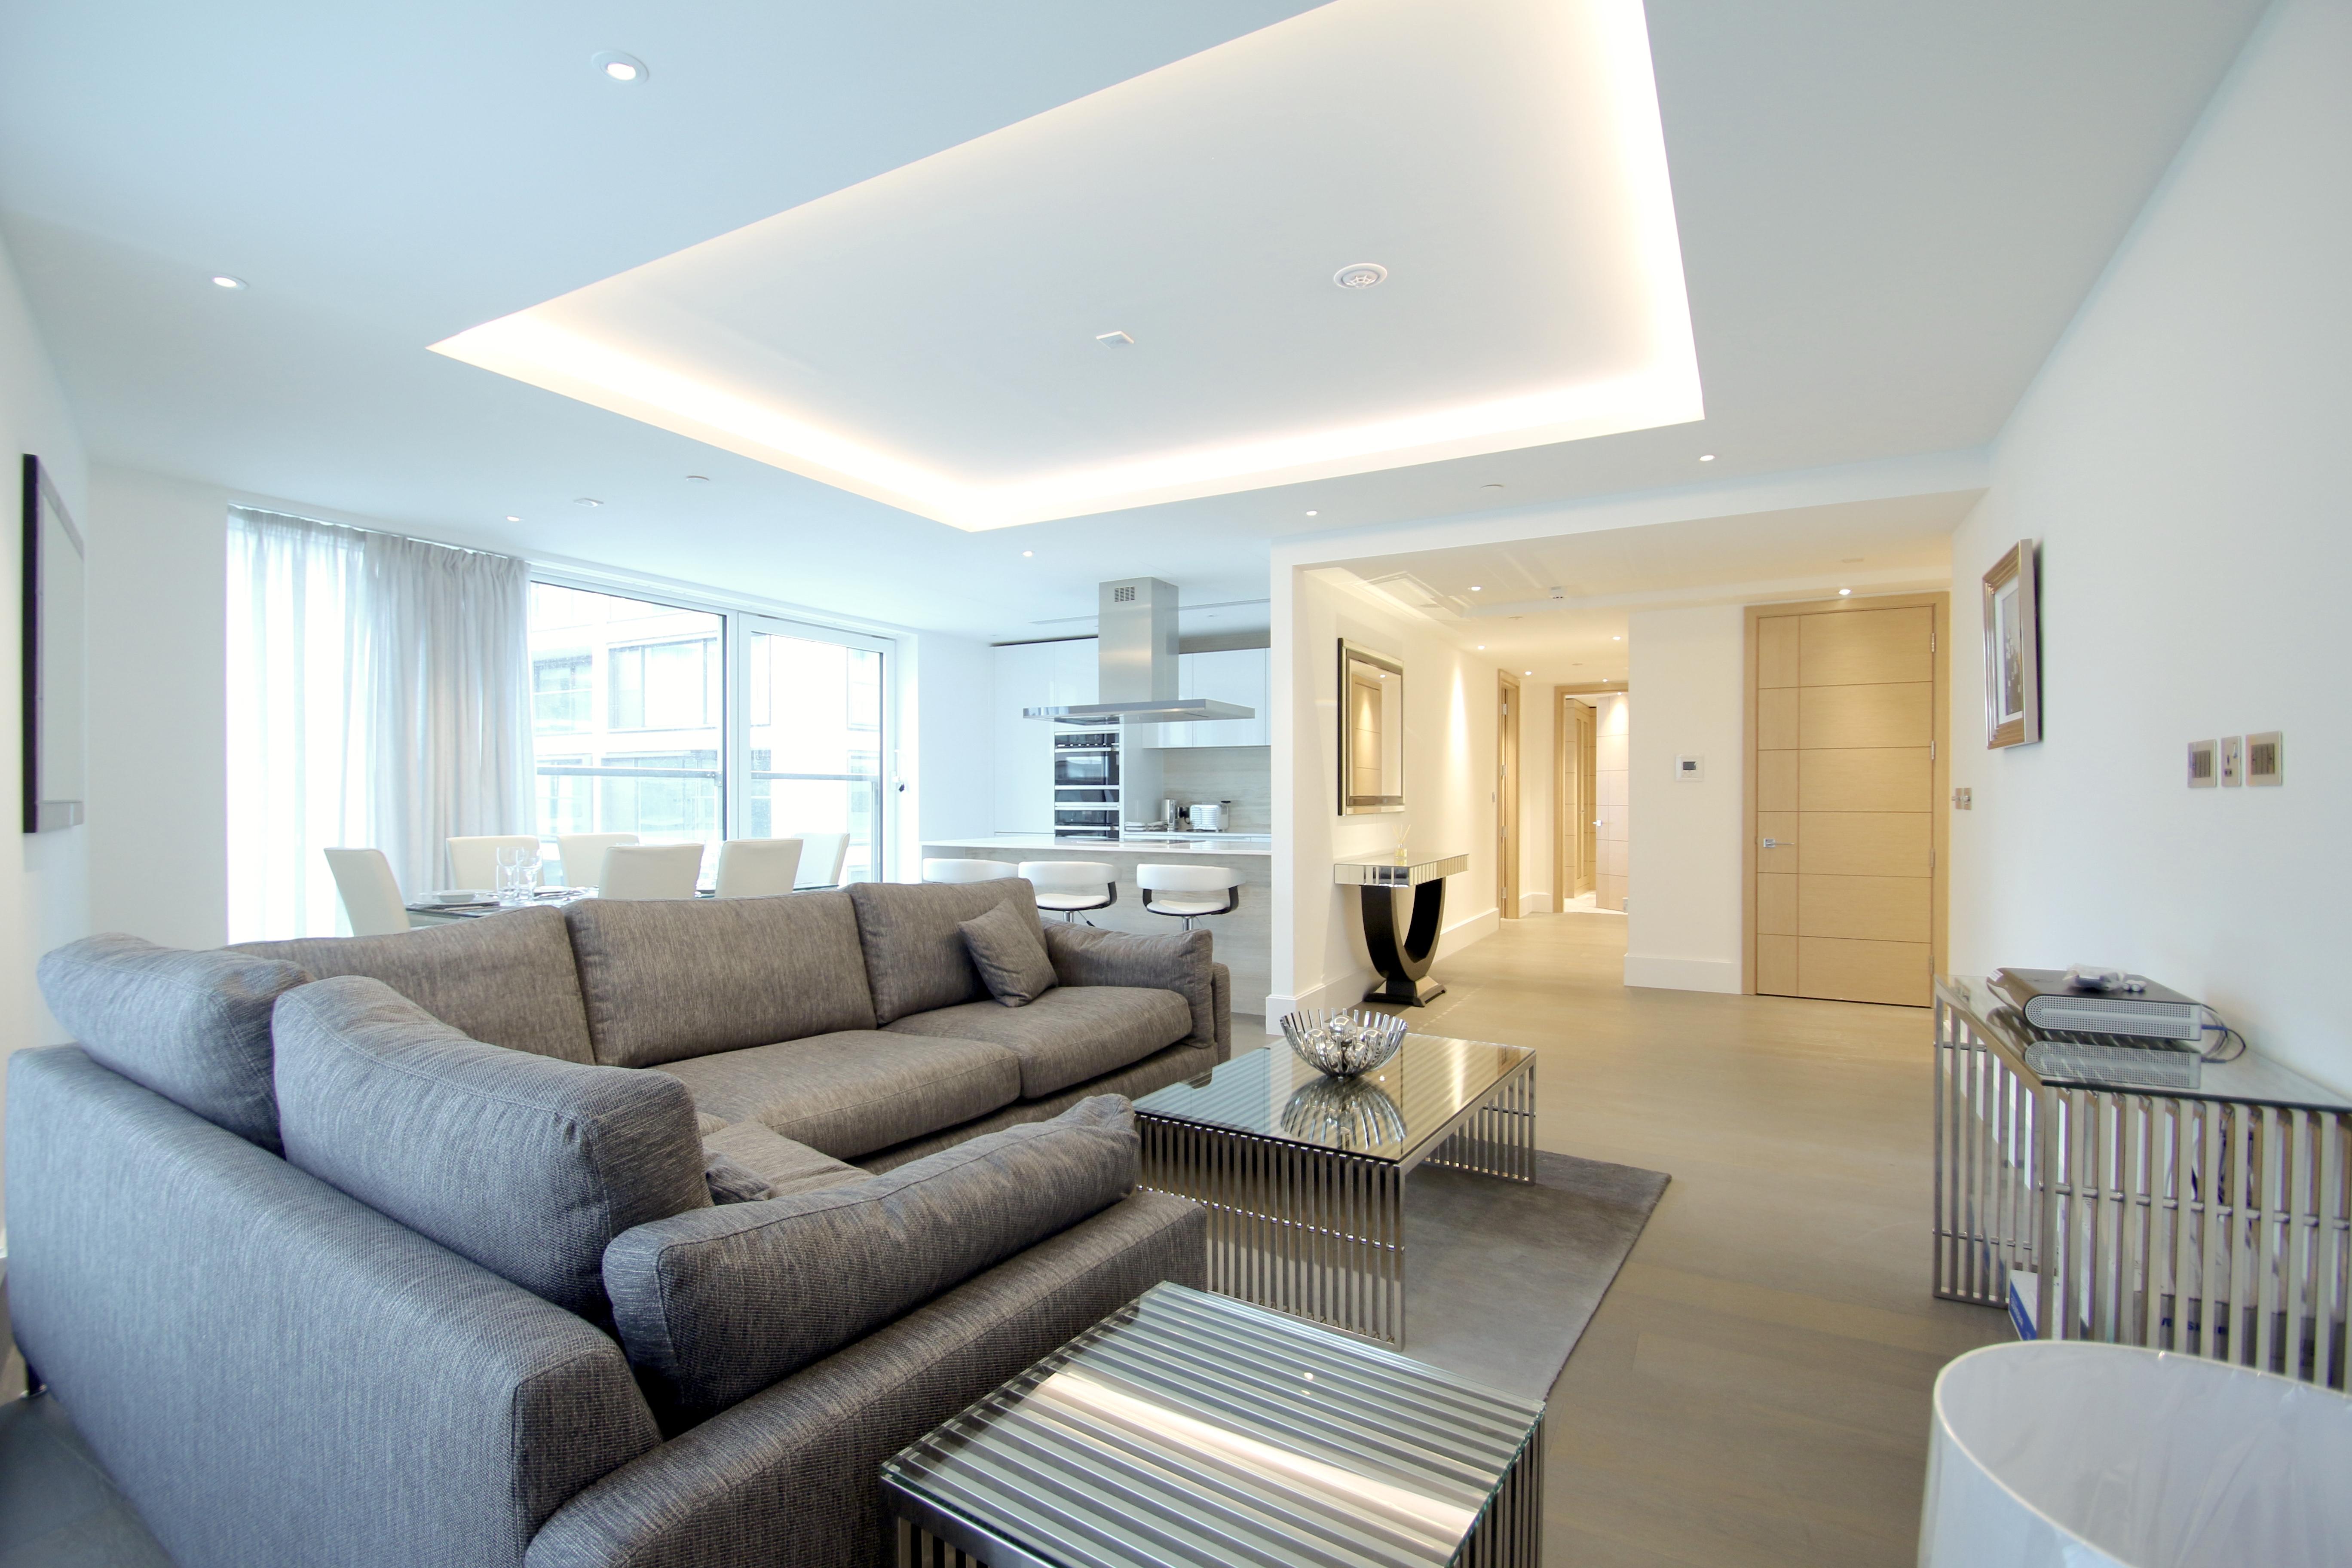 Radnor Terrace, Benson House, Kensington, London